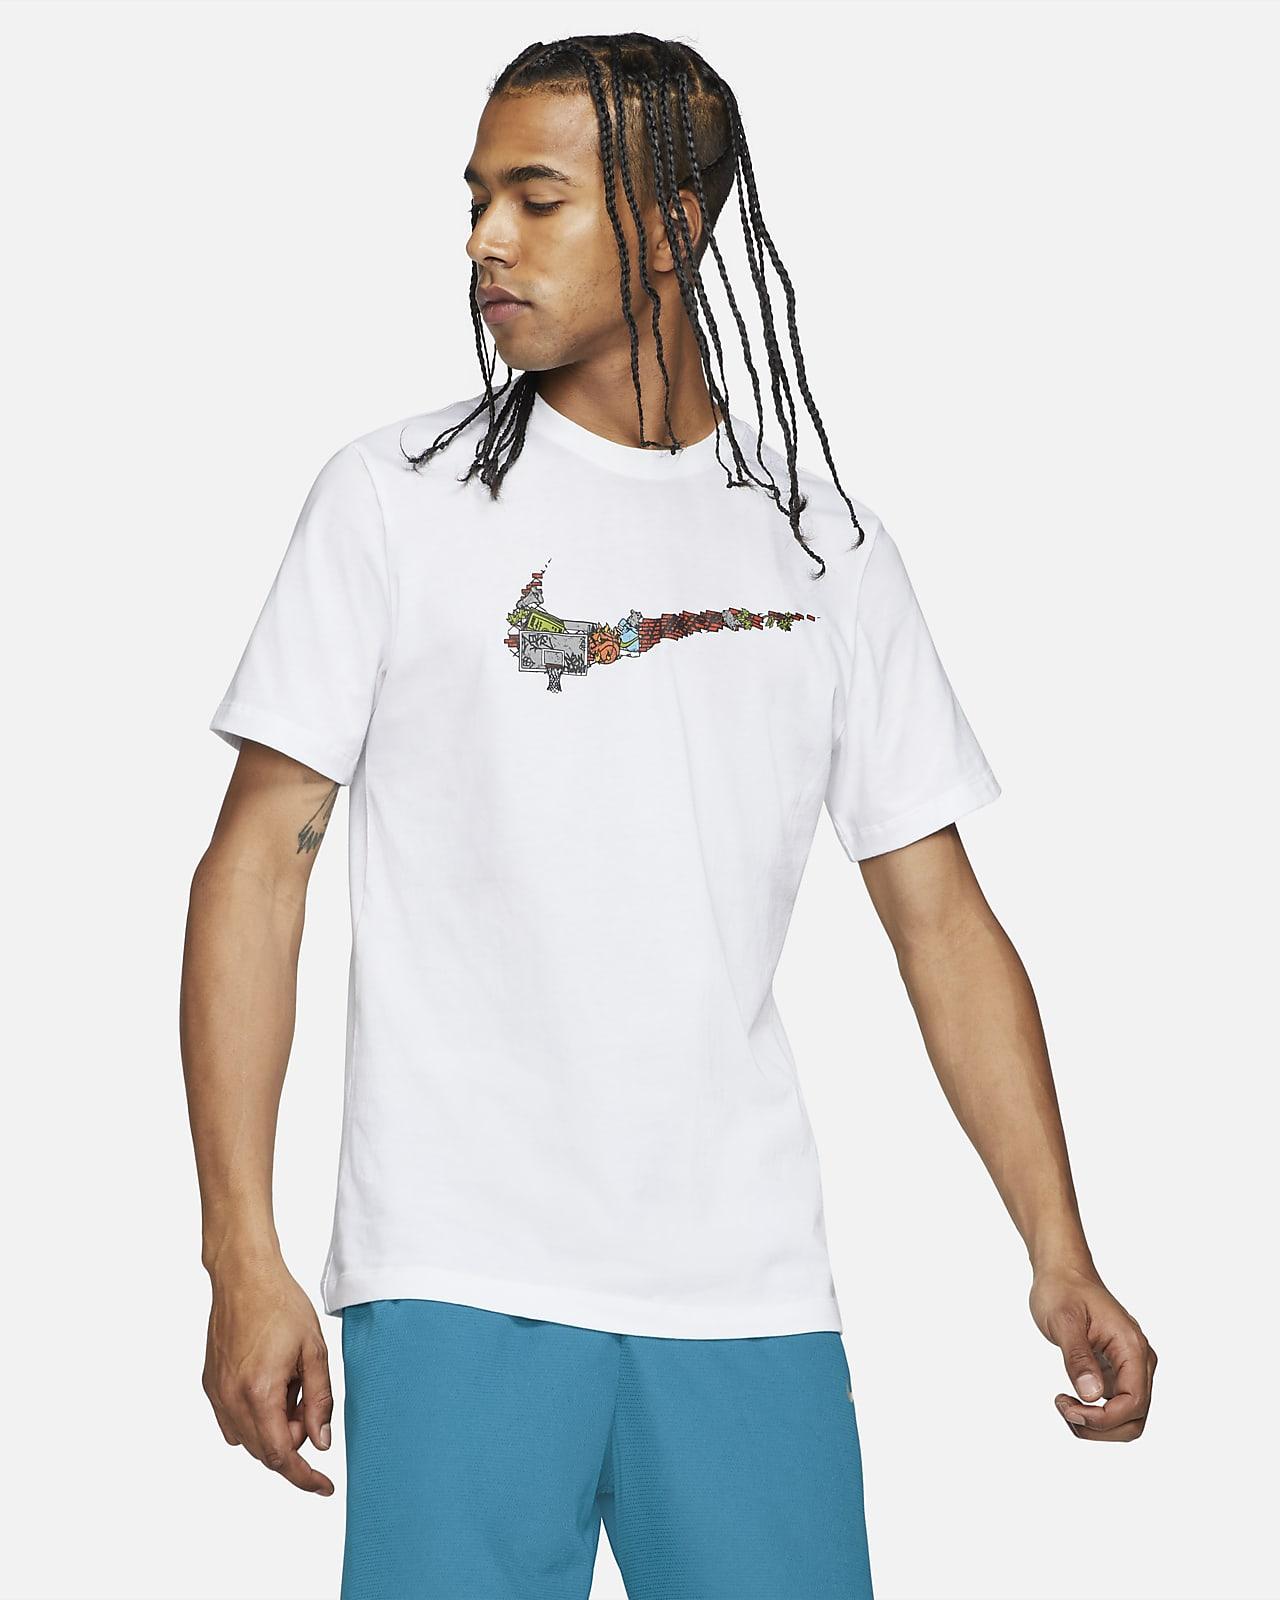 Playera de básquetbol para hombre Nike Swoosh